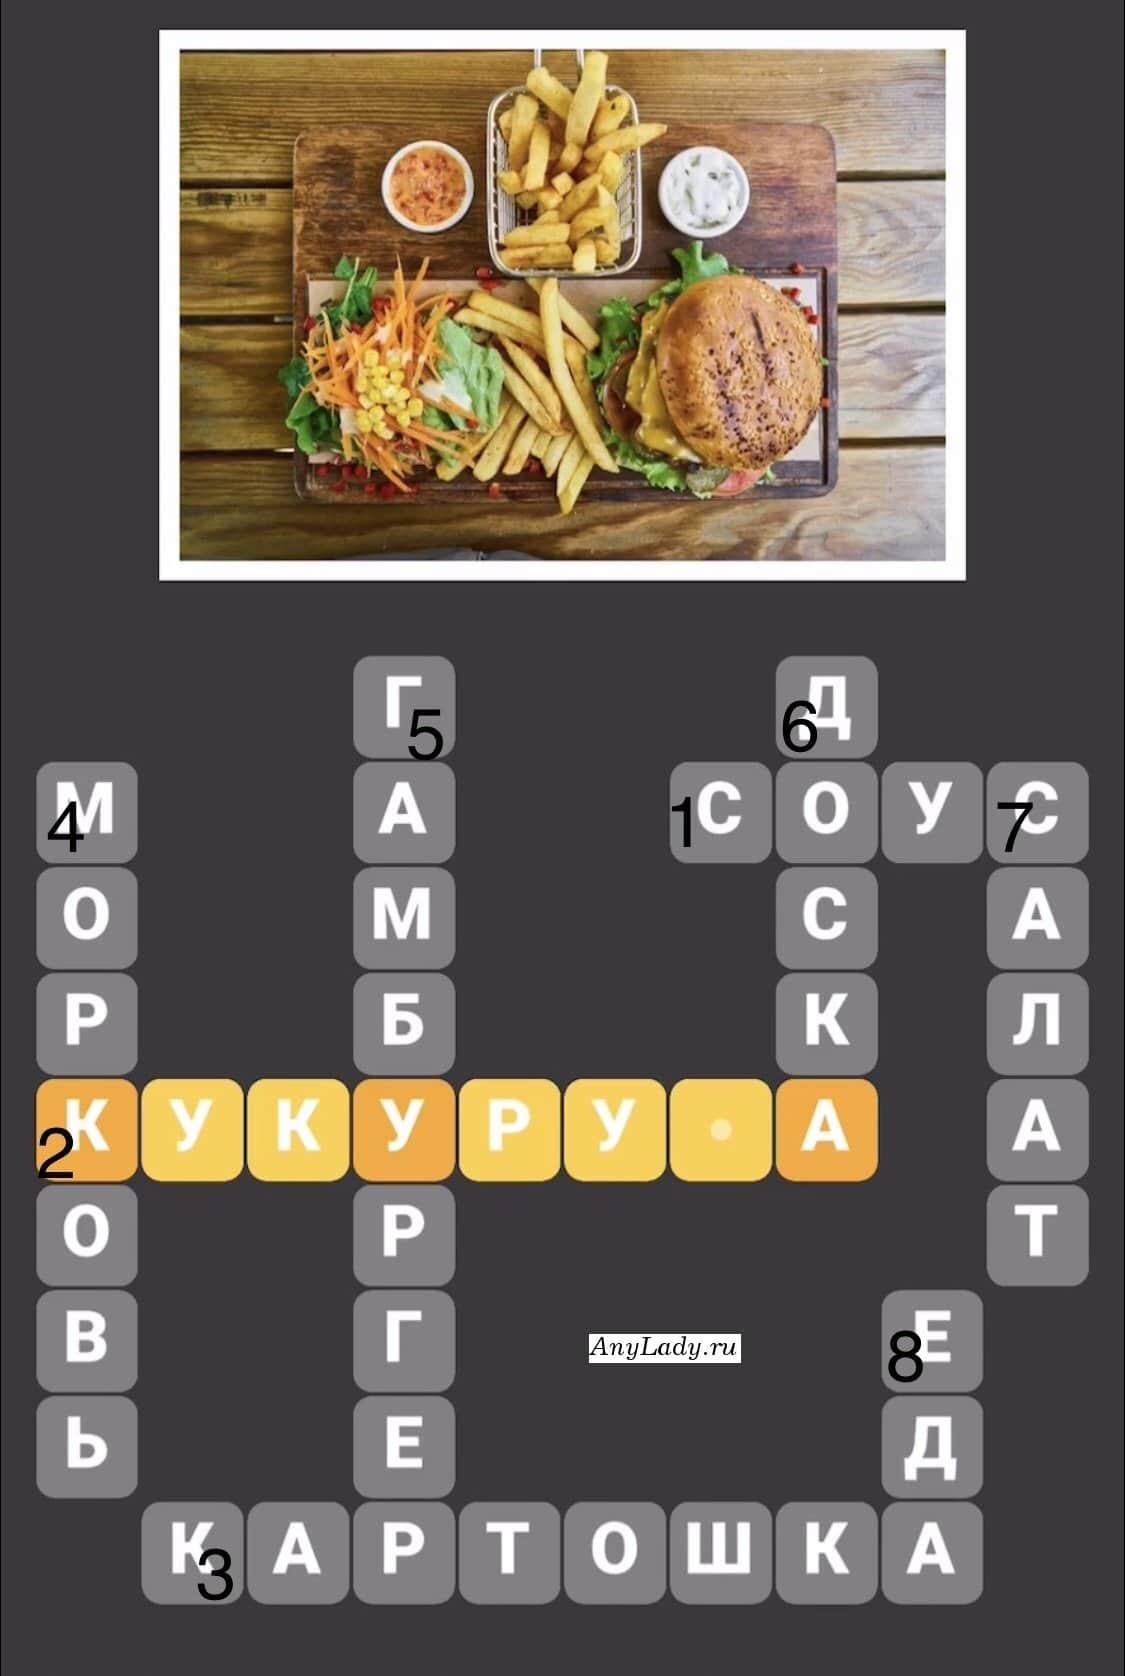 По горизонтали:  1. Соус  2. Кукуруза  3. Картошка По вертикали:  4. Морковь  5. Гамбургер  6. Доска  7. Салат  8. Еда